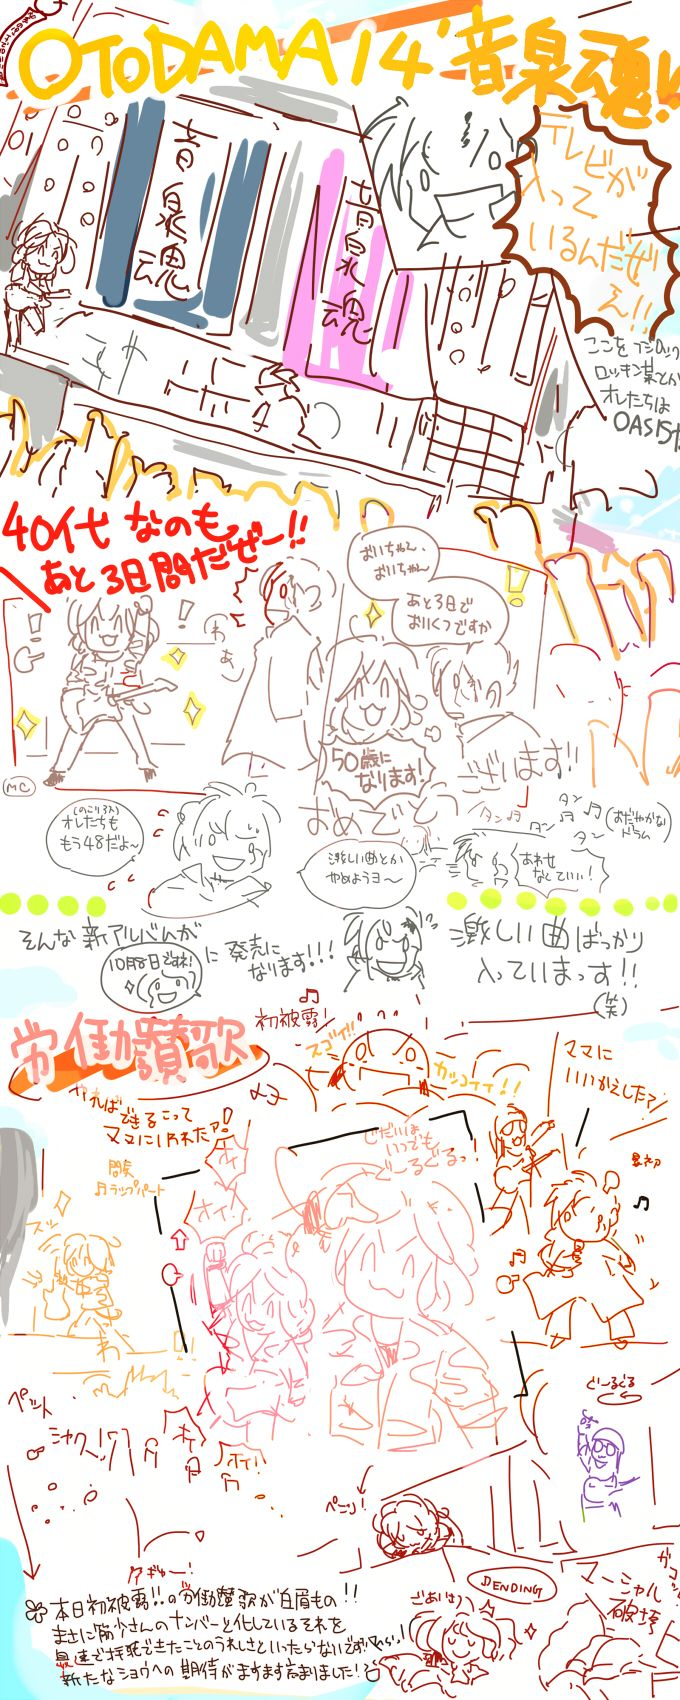 2014/9/7 OTODAMA'14@泉大津フェニックス